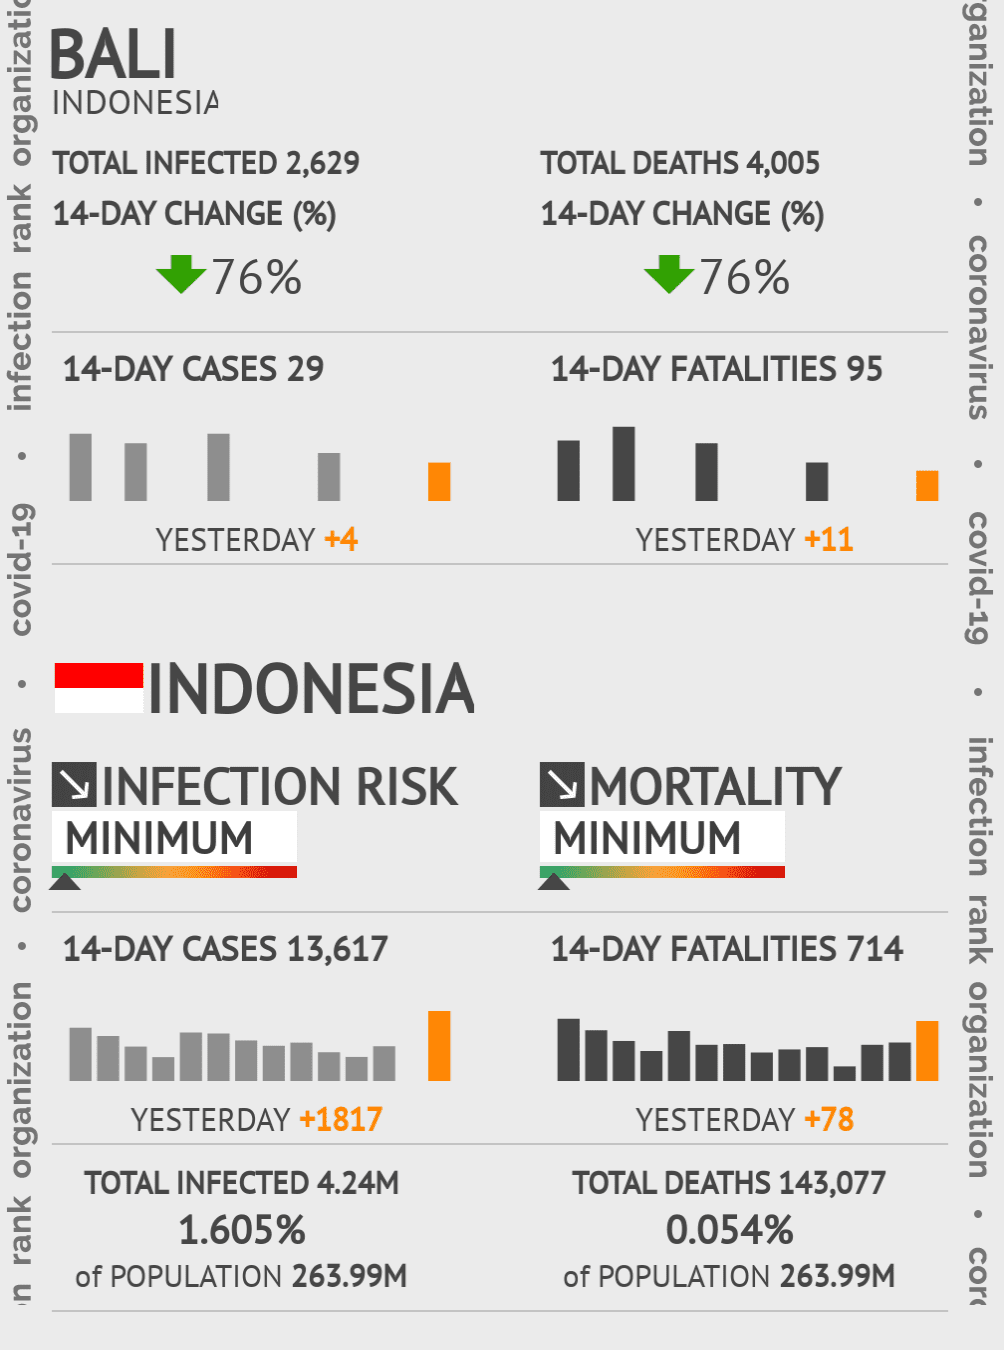 Bali Coronavirus Covid-19 Risk of Infection on March 07, 2021